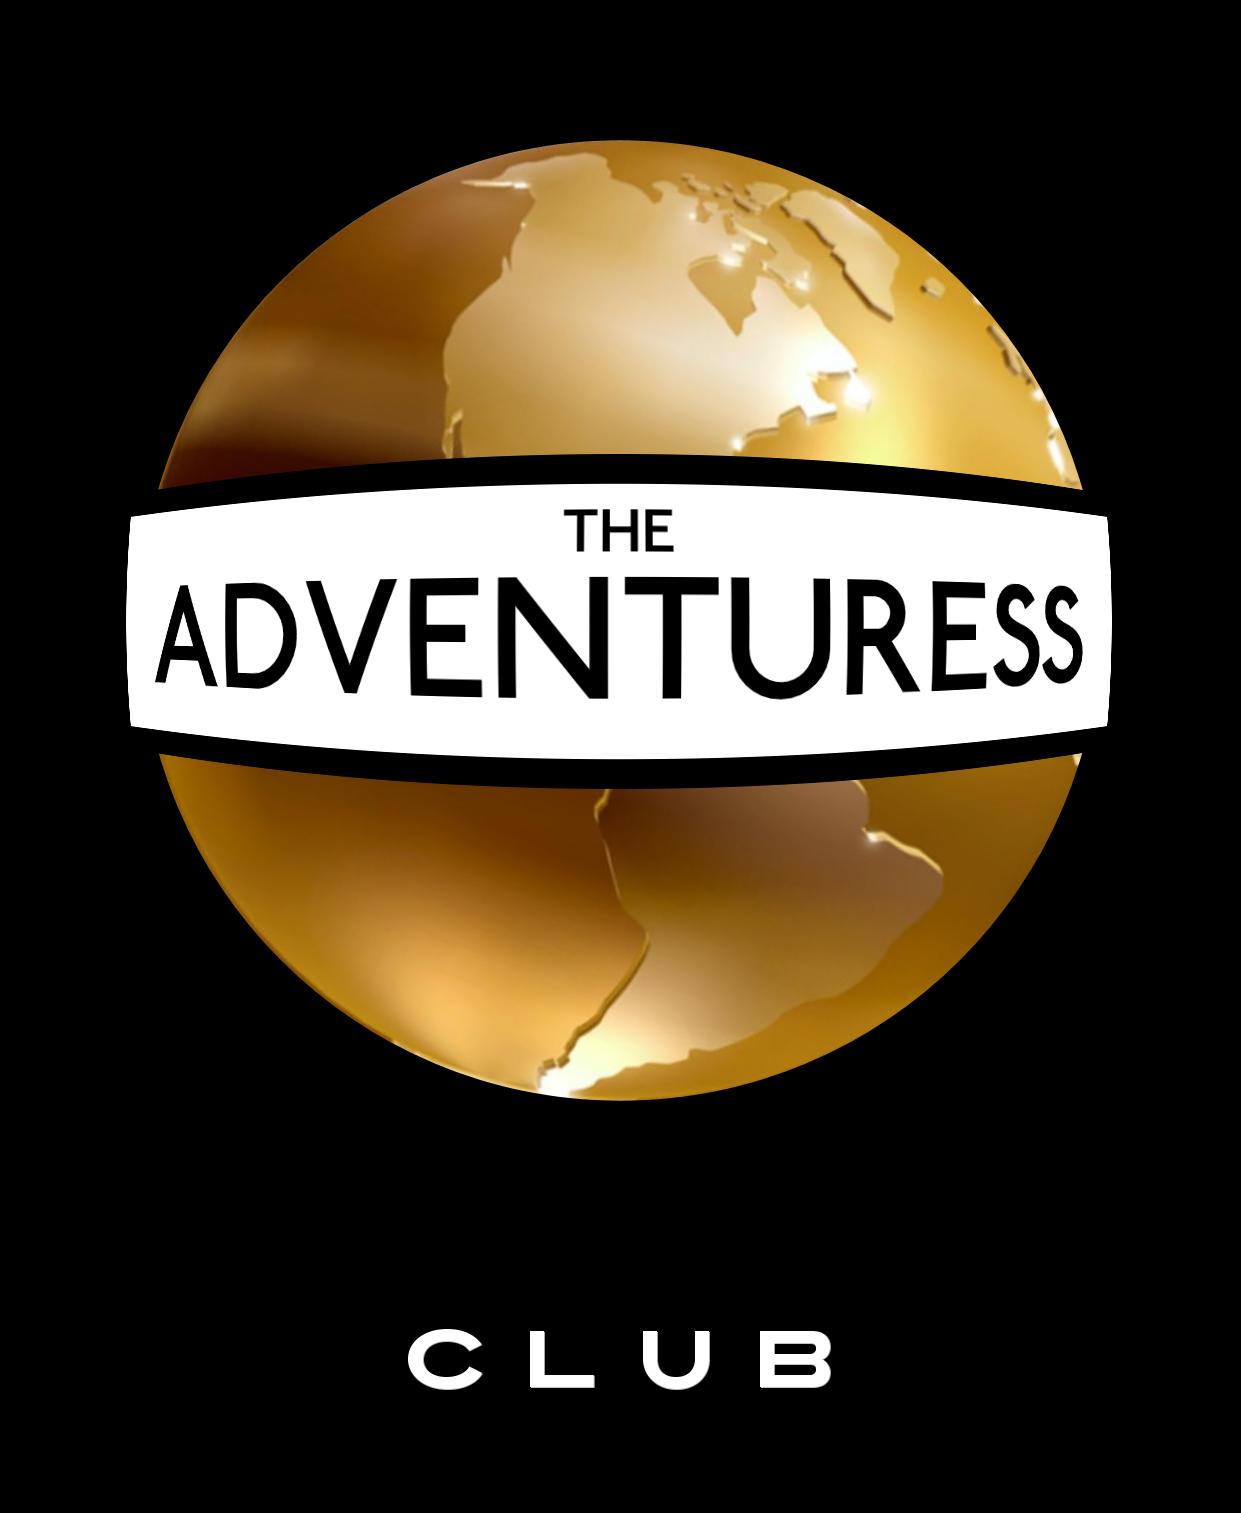 THE ADVENTURESS CLUB LOGO